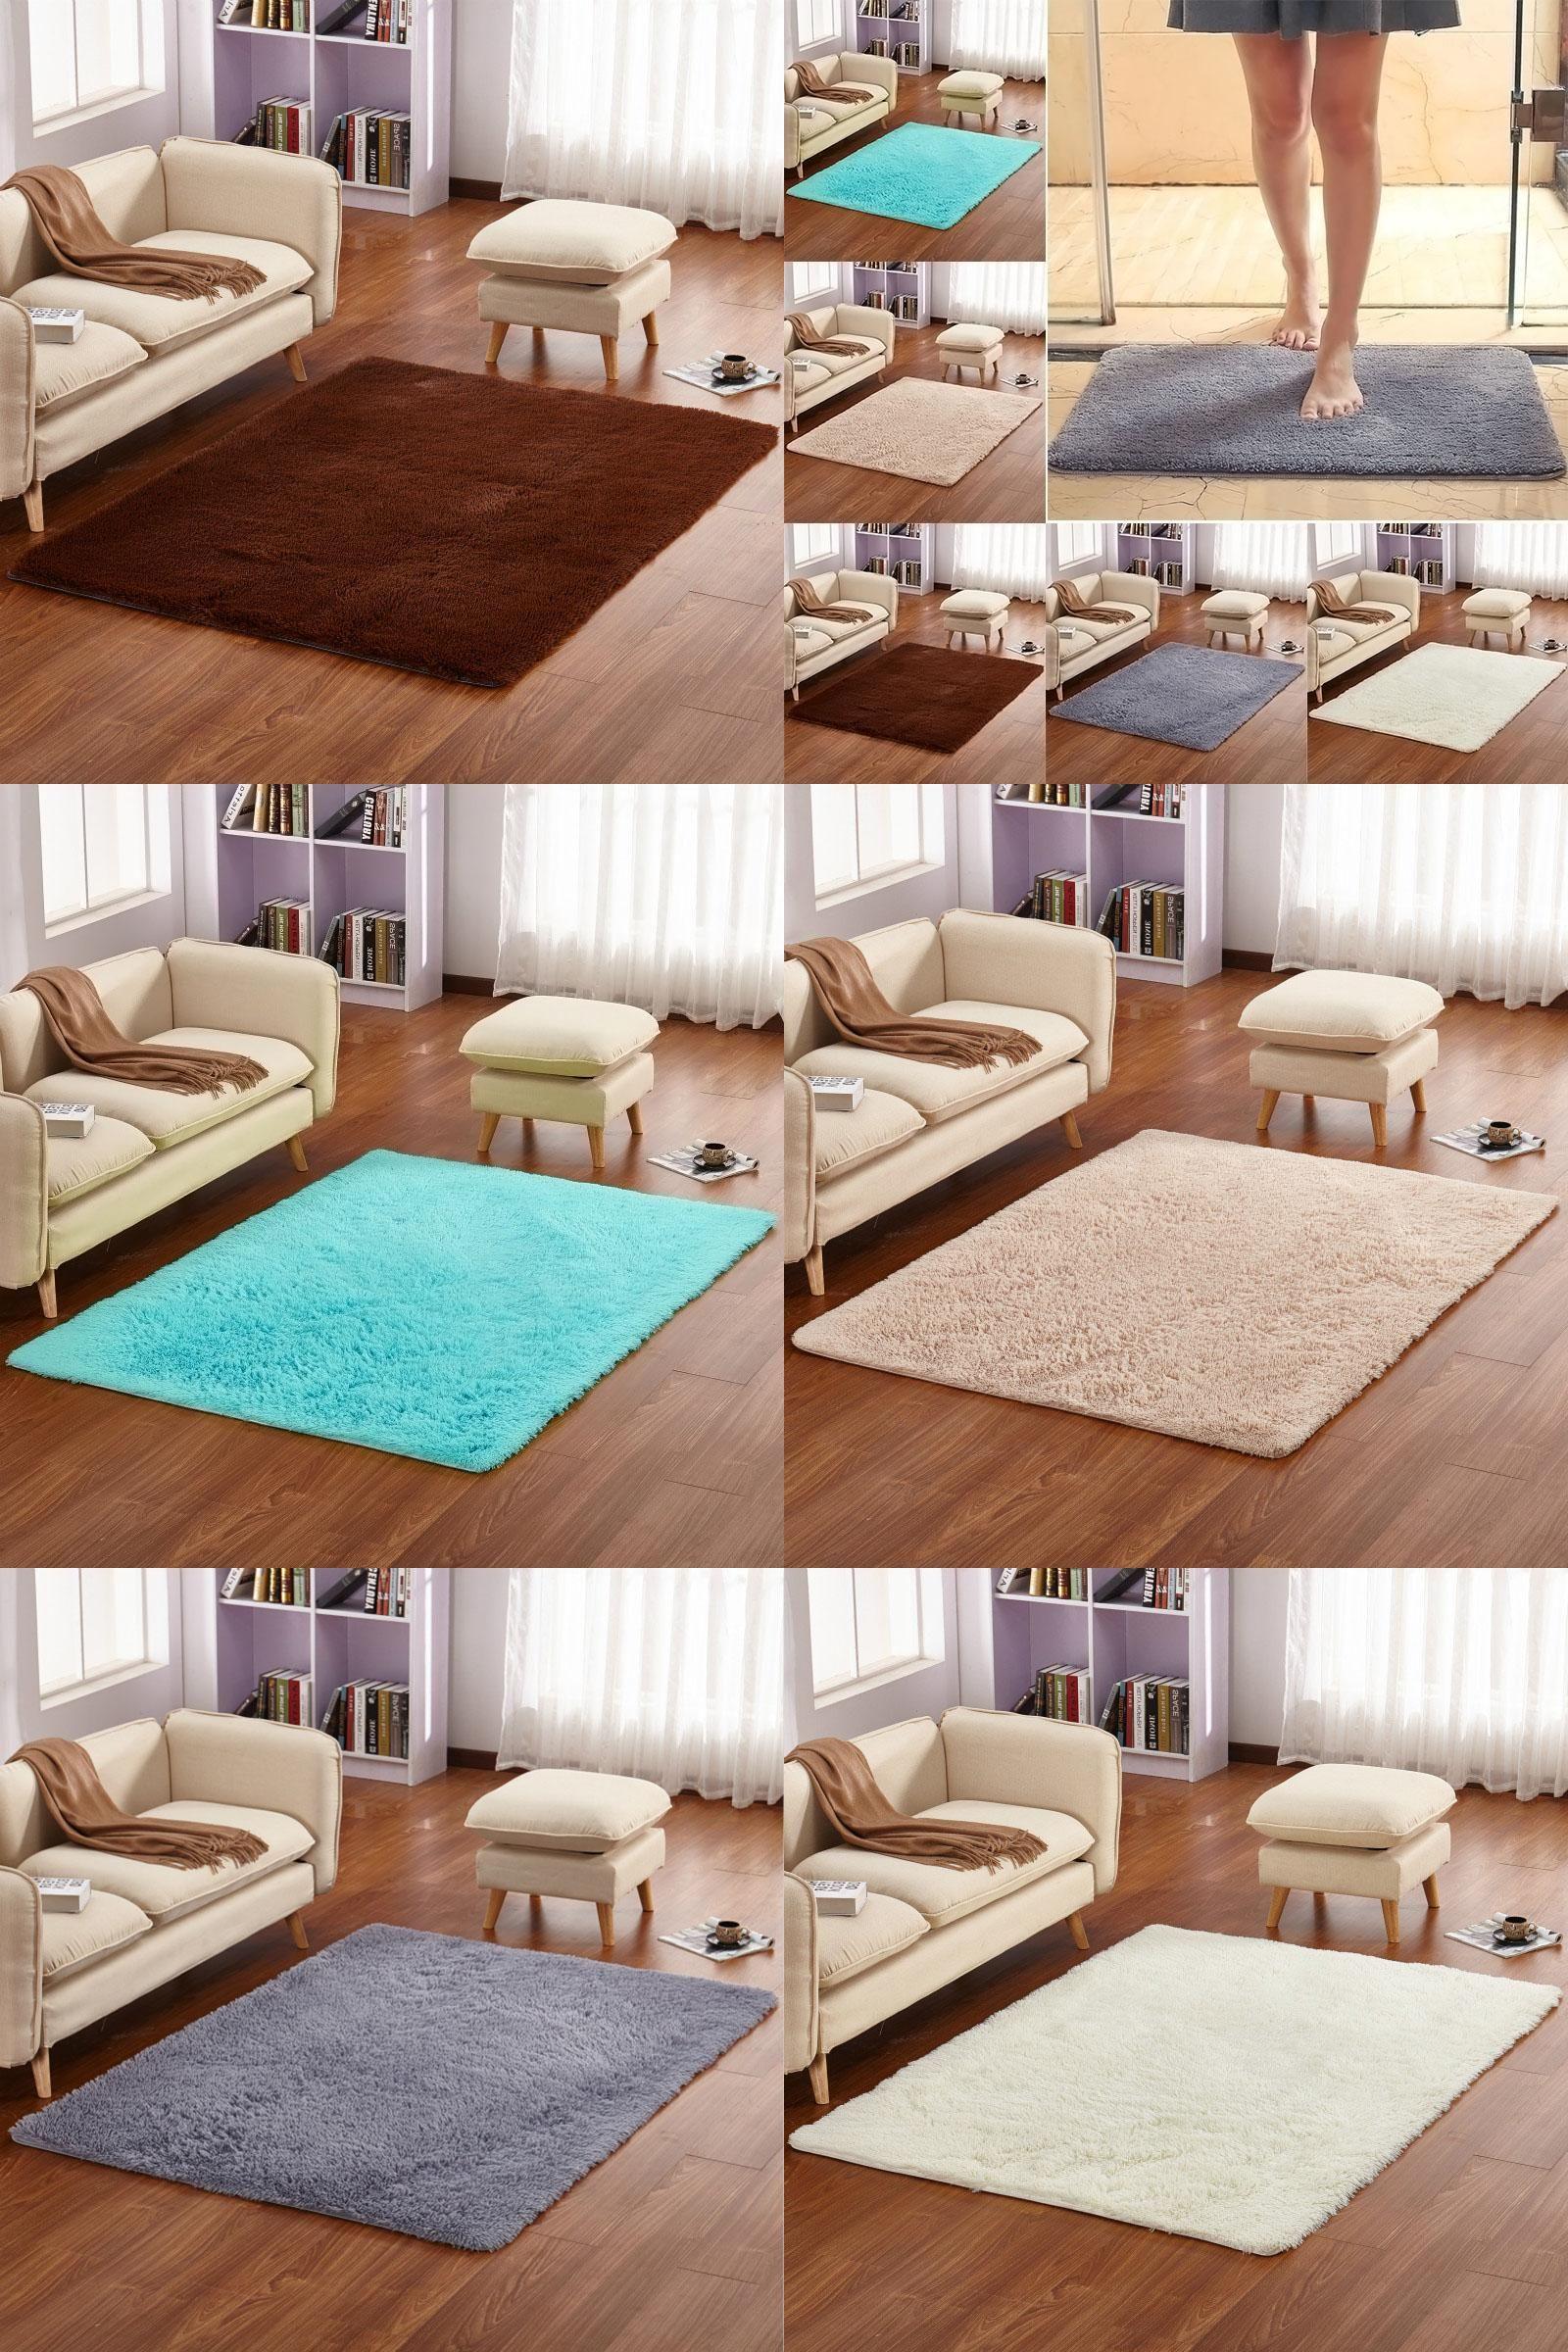 [Visit To Buy] Home Soft Mats Carpet Sofa Coffee Table Plush Carpet Non Slip Part 47